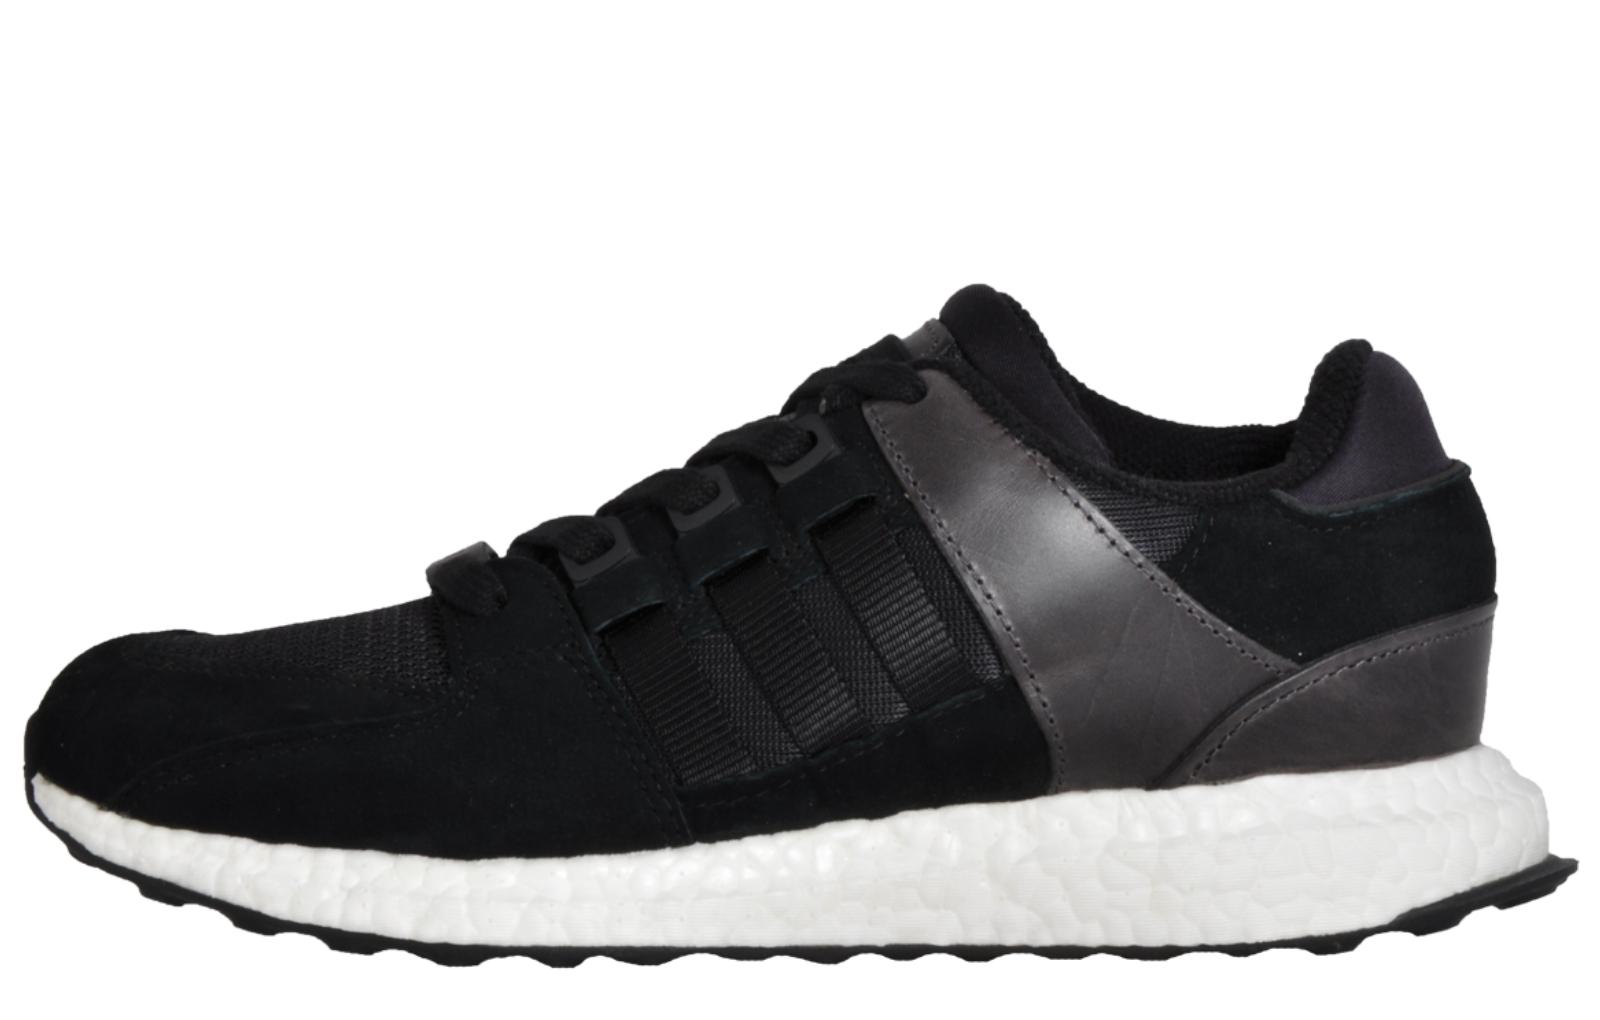 3b12be33633e8 Adidas Originals EQT Support Ultraboost Men s Running Shoes Gym Trainers  Black